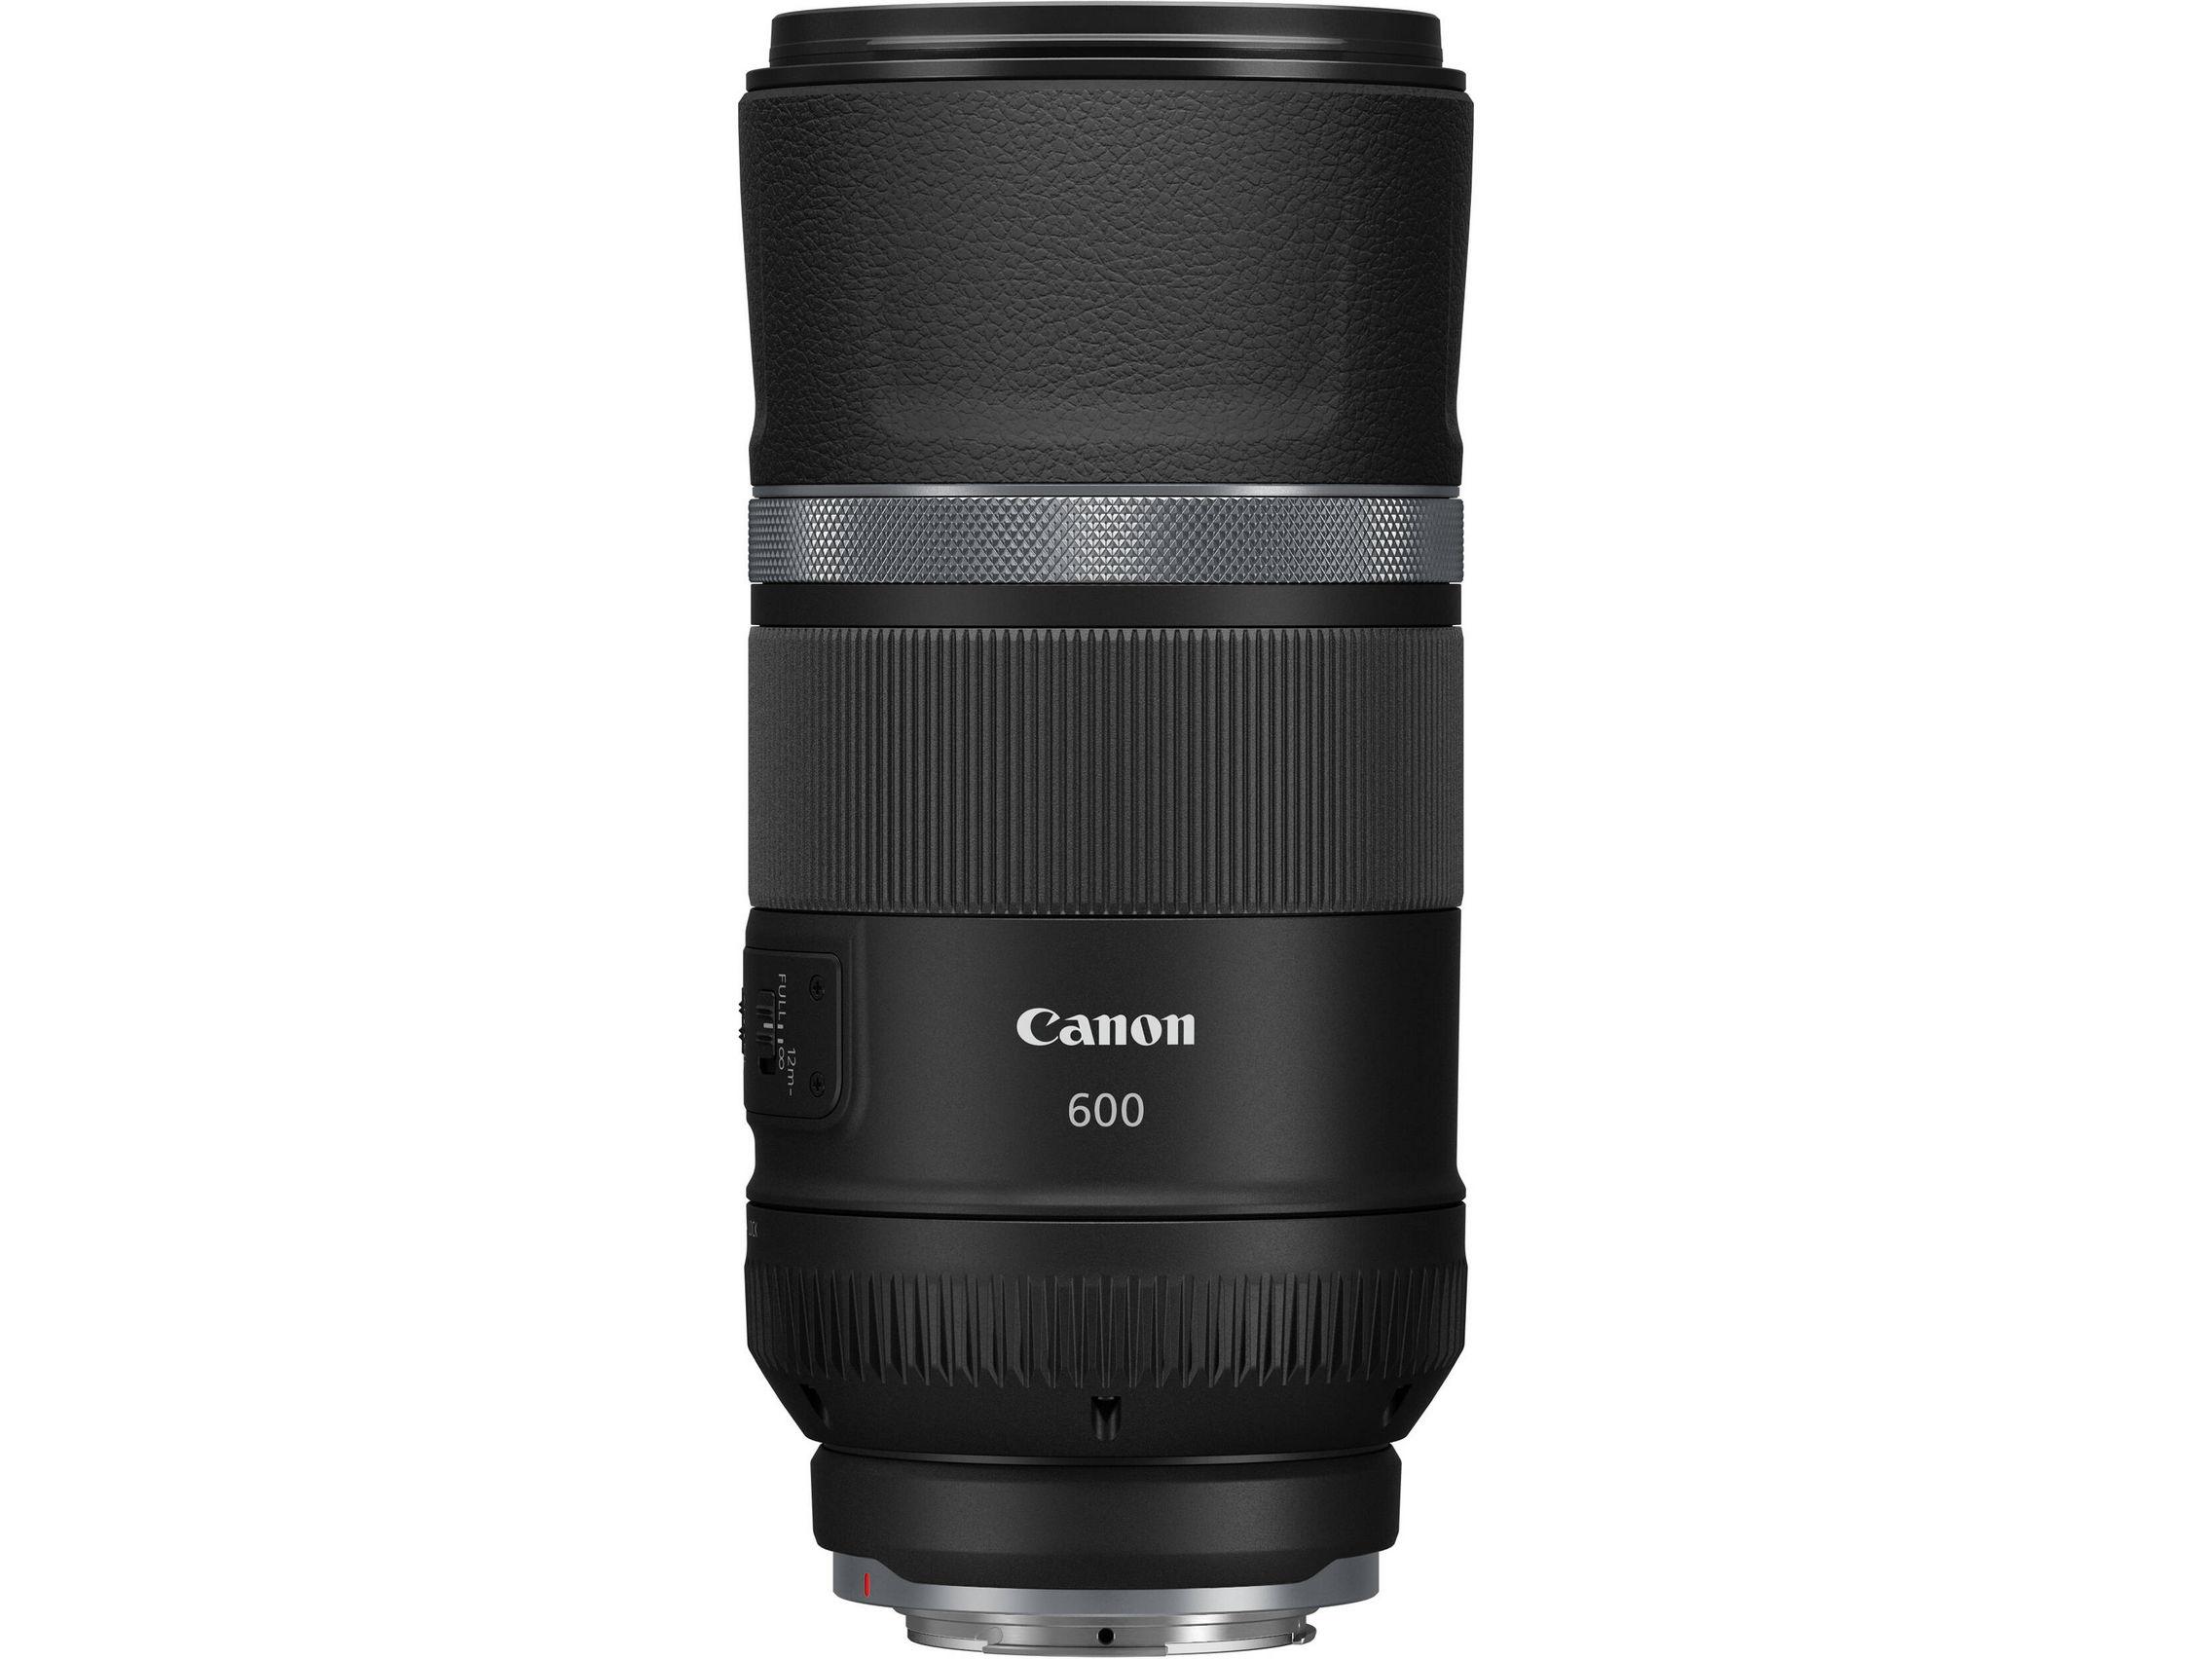 Canon Lens RF 600mm F11 IS STM